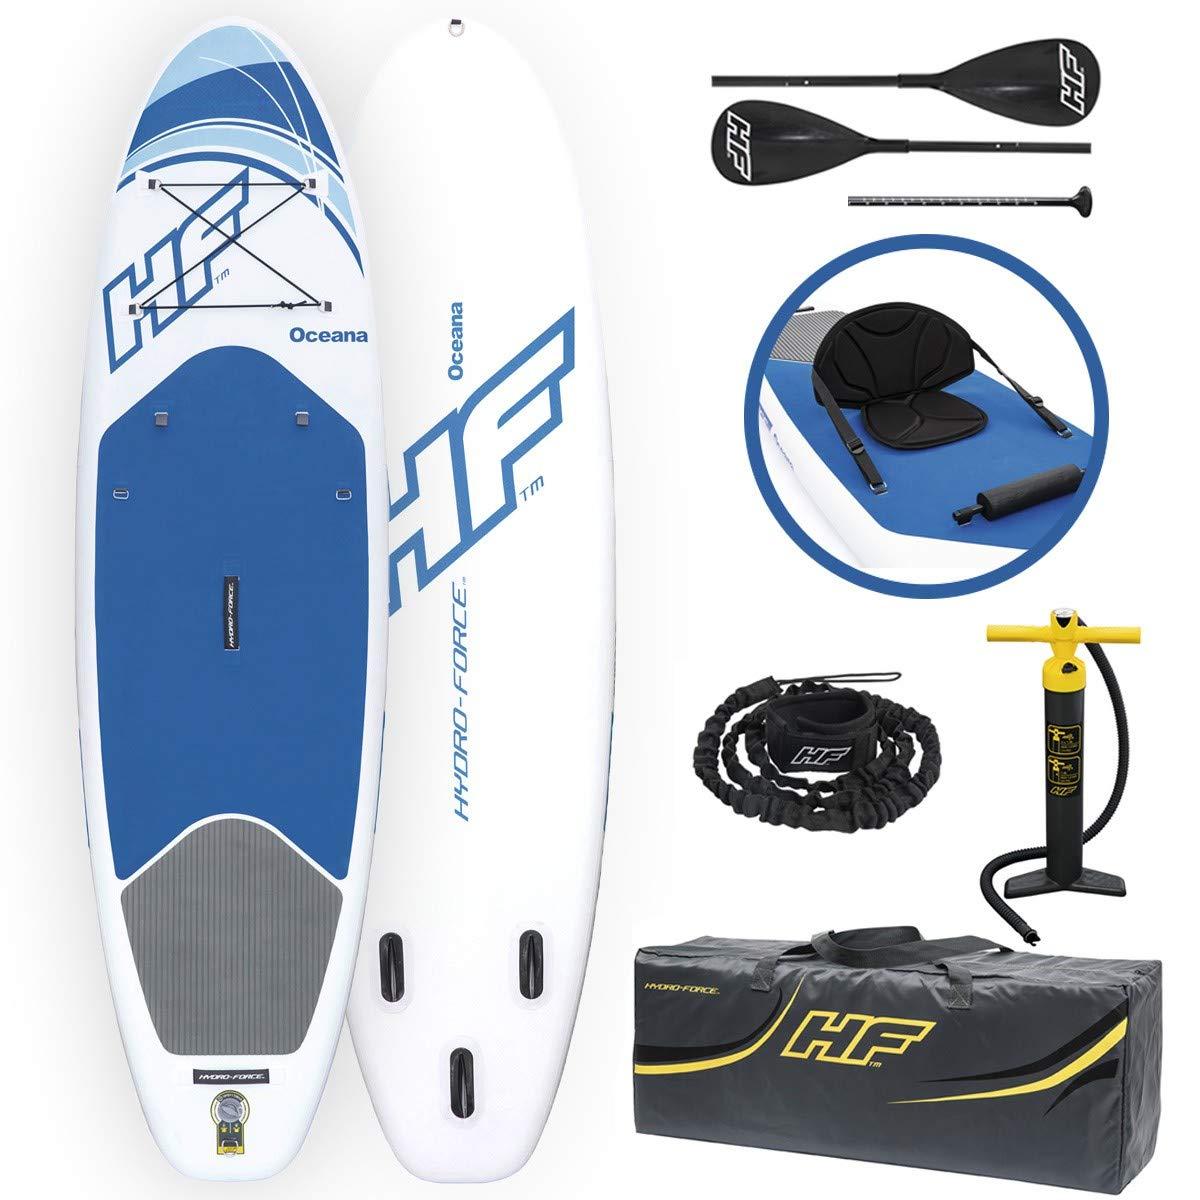 BEST WAY (BES)- Bestway Hydro-Force iSUP Oceana 305x84x12 cm, aufblasbares Stand Up Paddle Allrounder-Board mit Kajak-Sitz TAVOLA Surf 305x84x12 Remi, Multicolore, 123